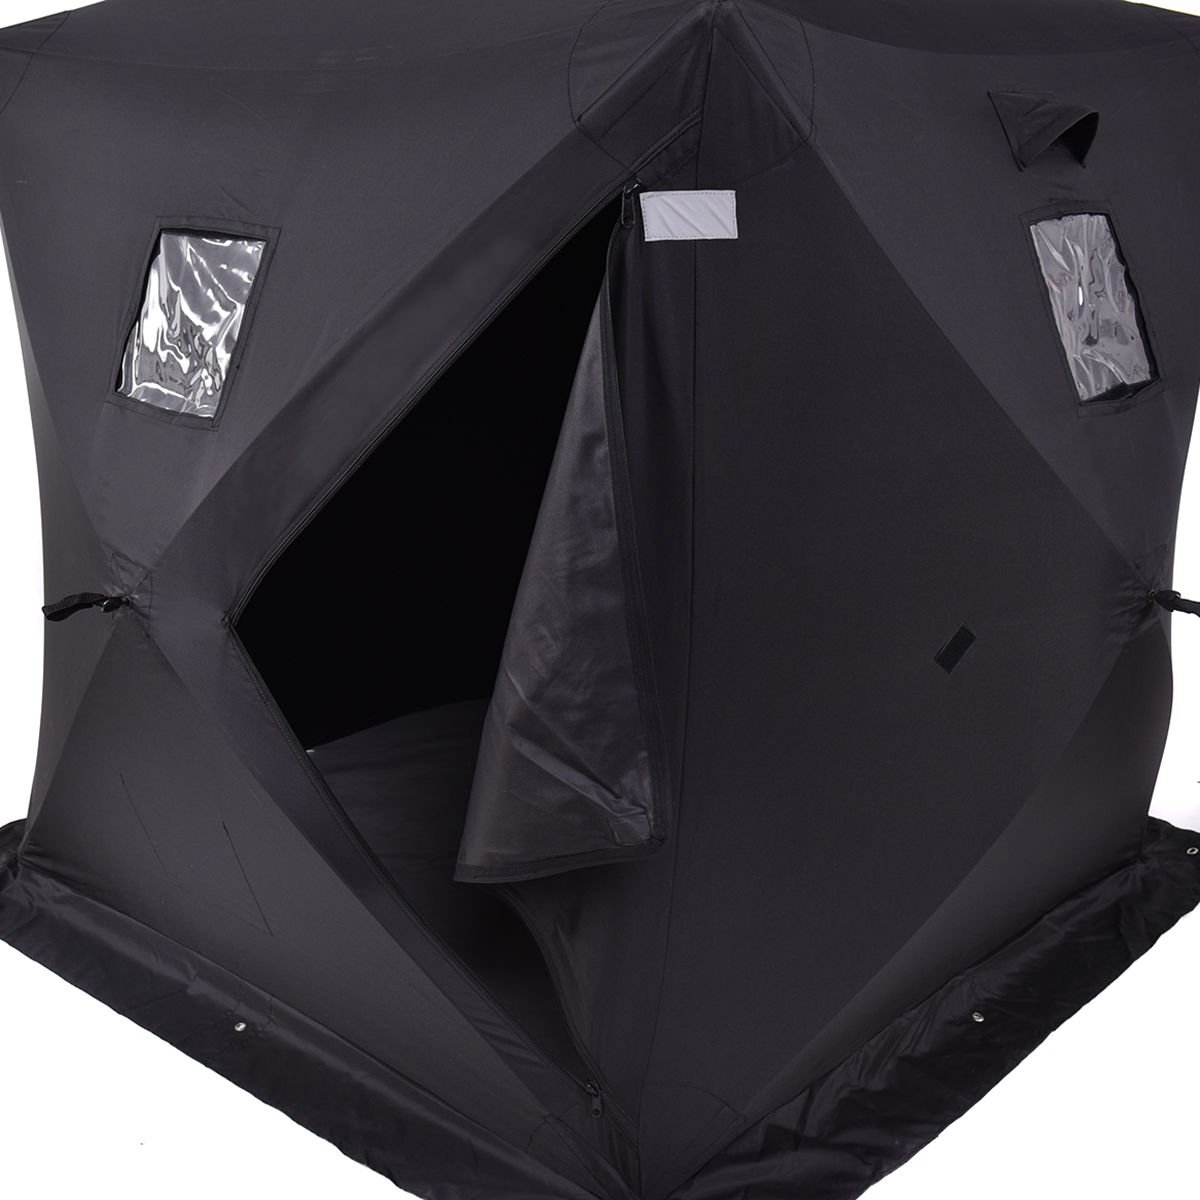 Amazon.com  Tangkula 2-person Pop Up Portable Ice Shelter Fishing Tent House Shanty  Sports u0026 Outdoors & Amazon.com : Tangkula 2-person Pop Up Portable Ice Shelter Fishing ...